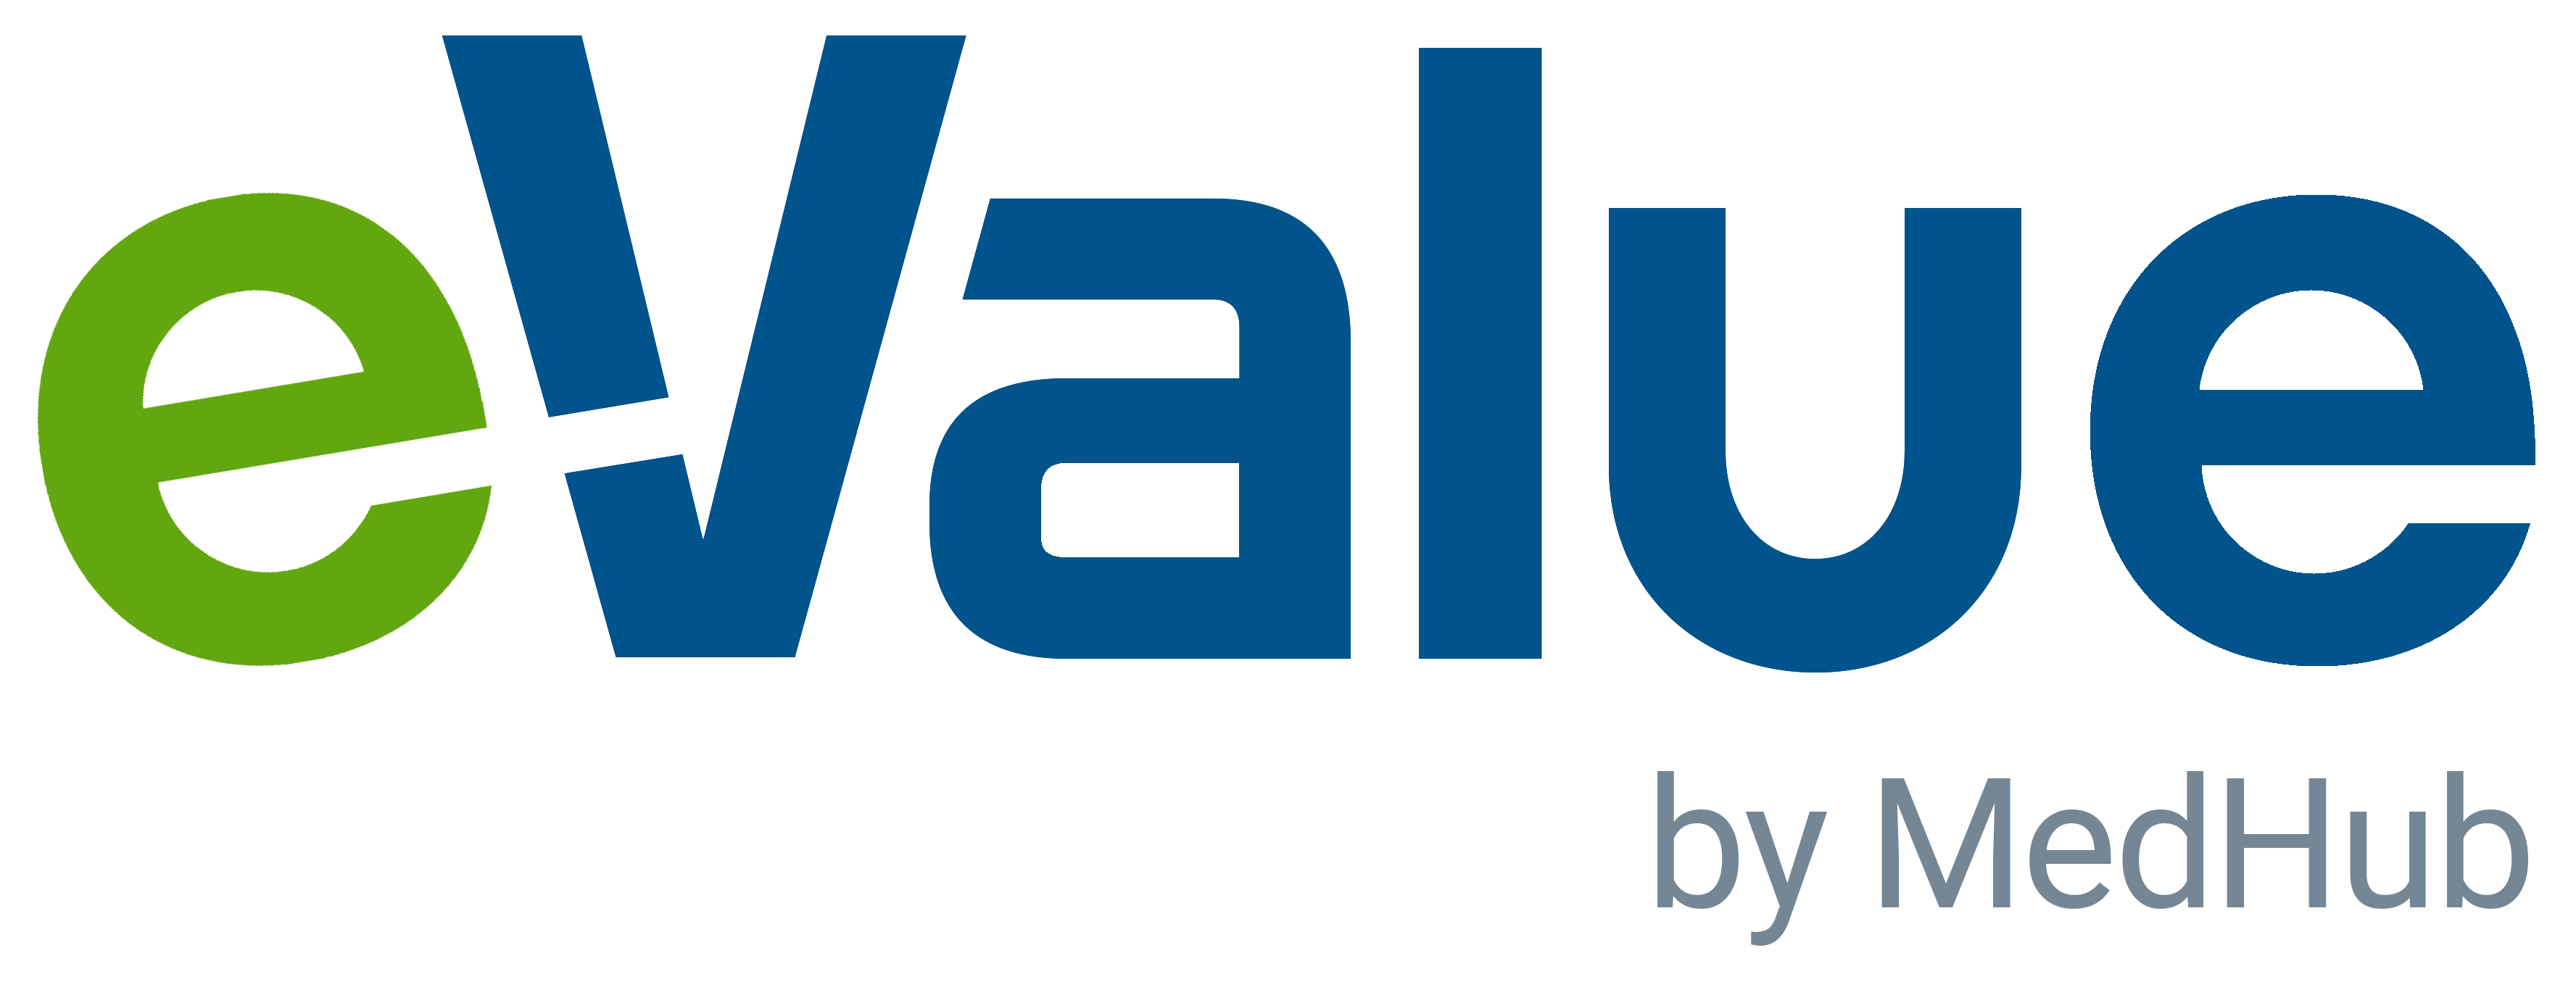 eValue by MedHub